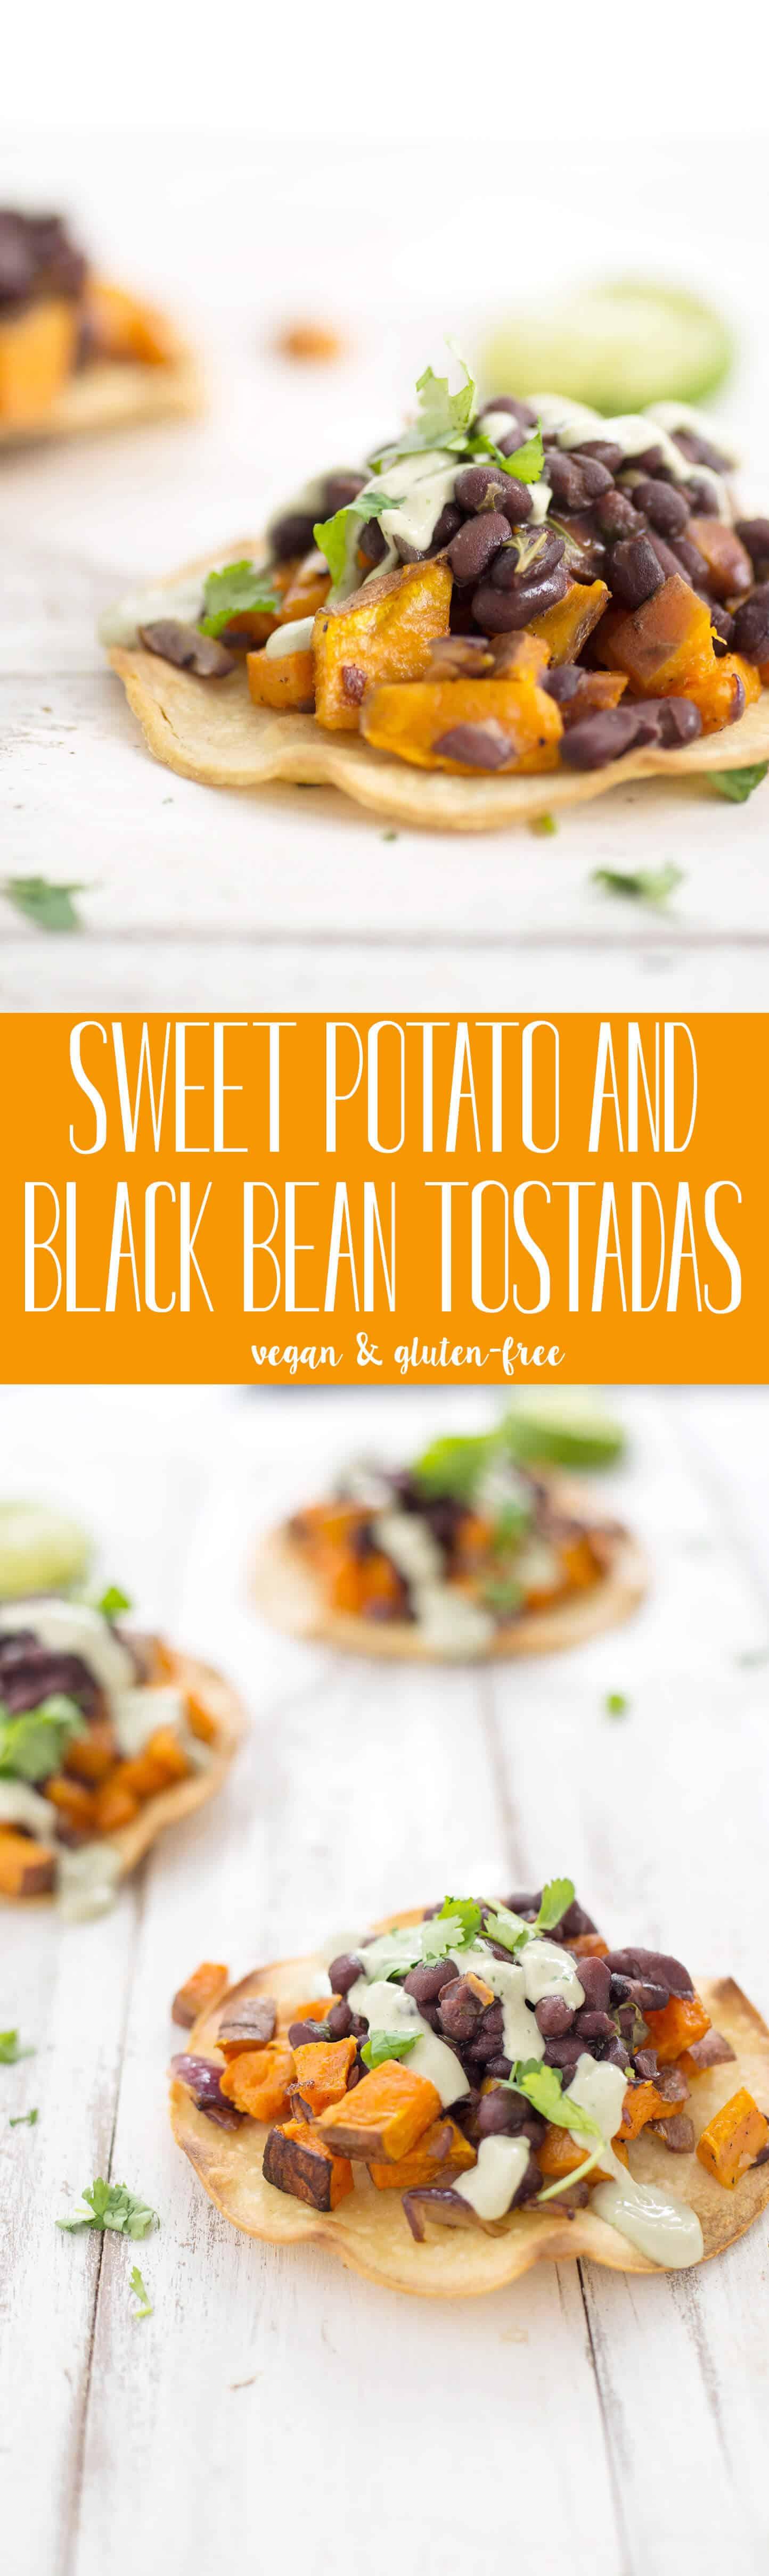 Black Bean and Sweet Potato Tostadas! Seasoned black beans piled high with roasted sweet potatoes, covered with avocado creme. Vegan & GlutenFree | www.delishknowledge.com